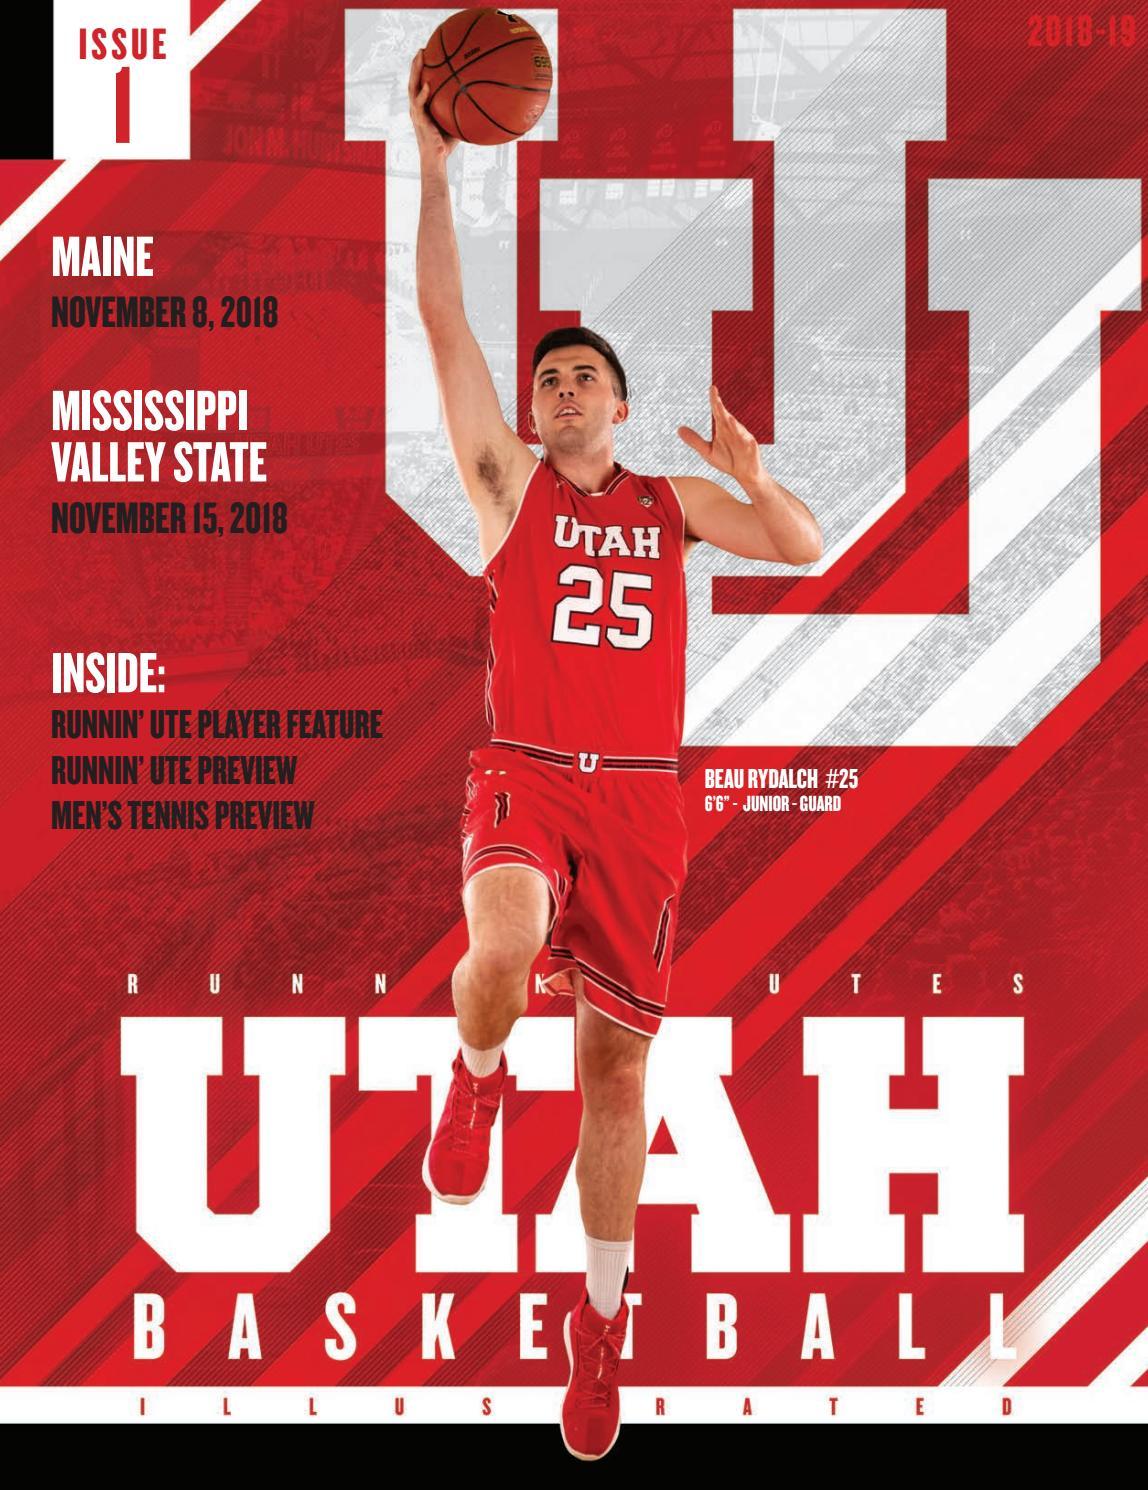 Utah Basketball 2018 19 Issue 1 By Mills Publishing Sports Issuu